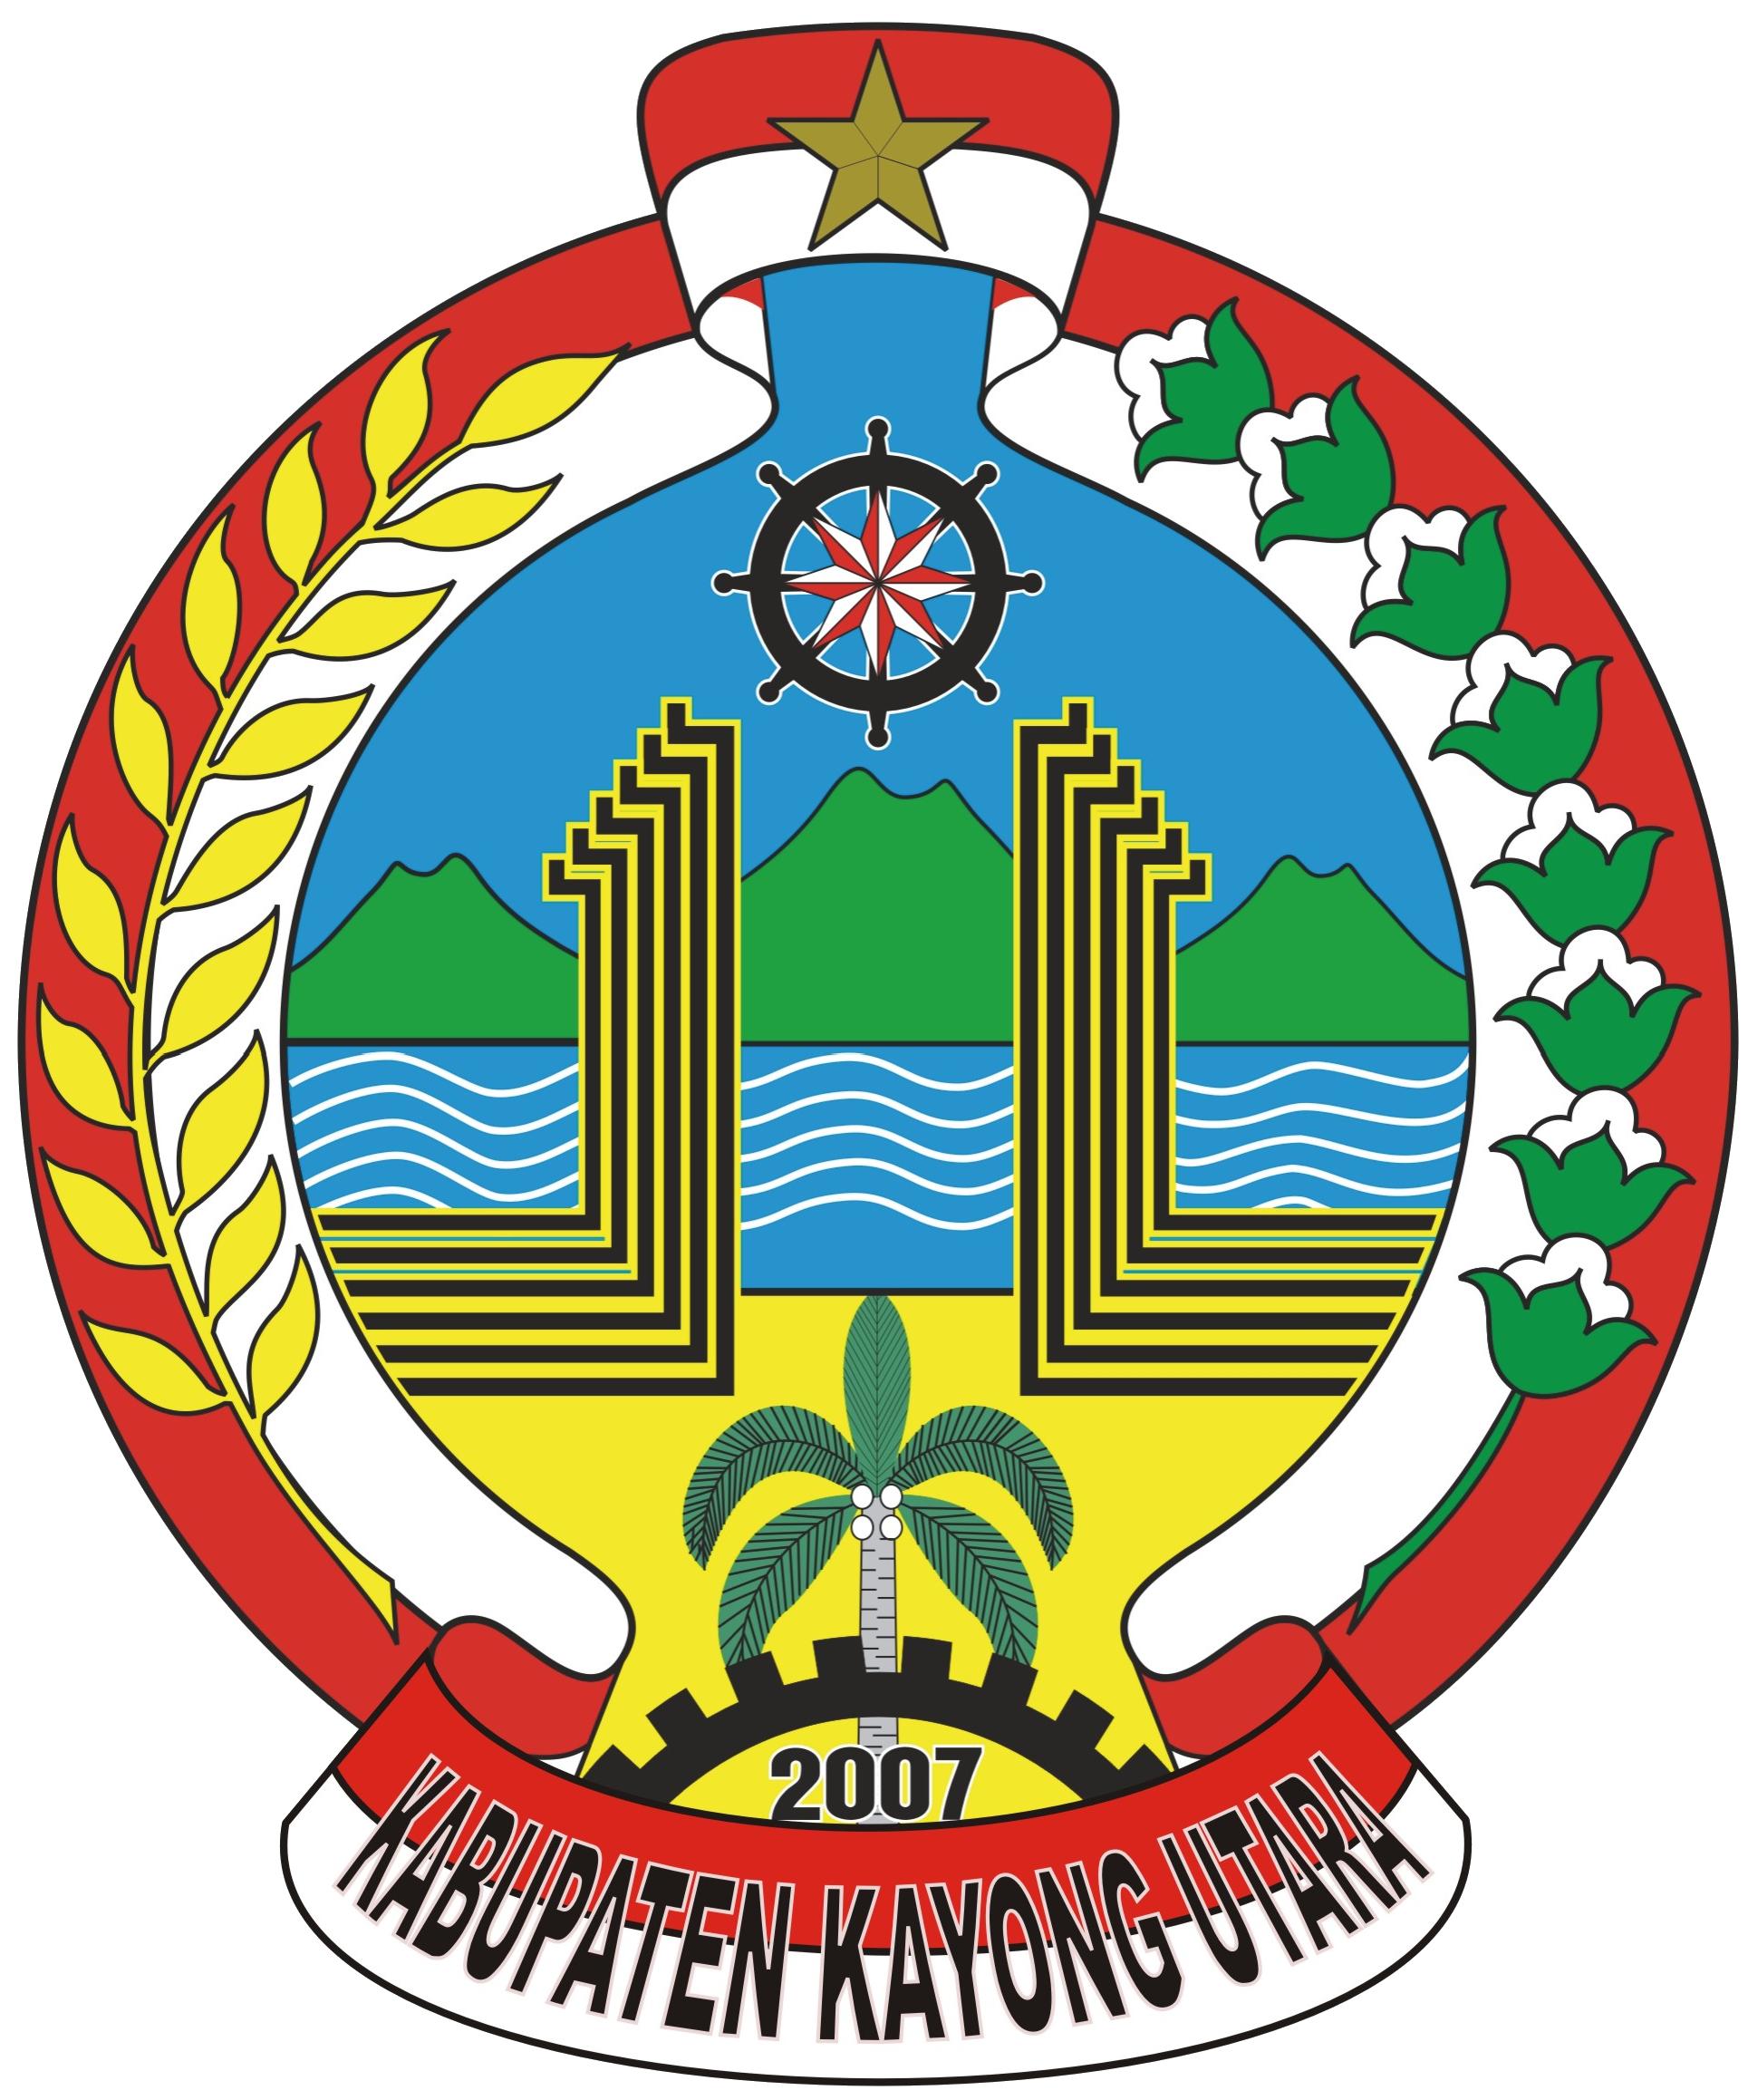 Berkas Lambang Daerah Kab Kayong Utara Png Wikipedia Bahasa Indonesia Ensiklopedia Bebas